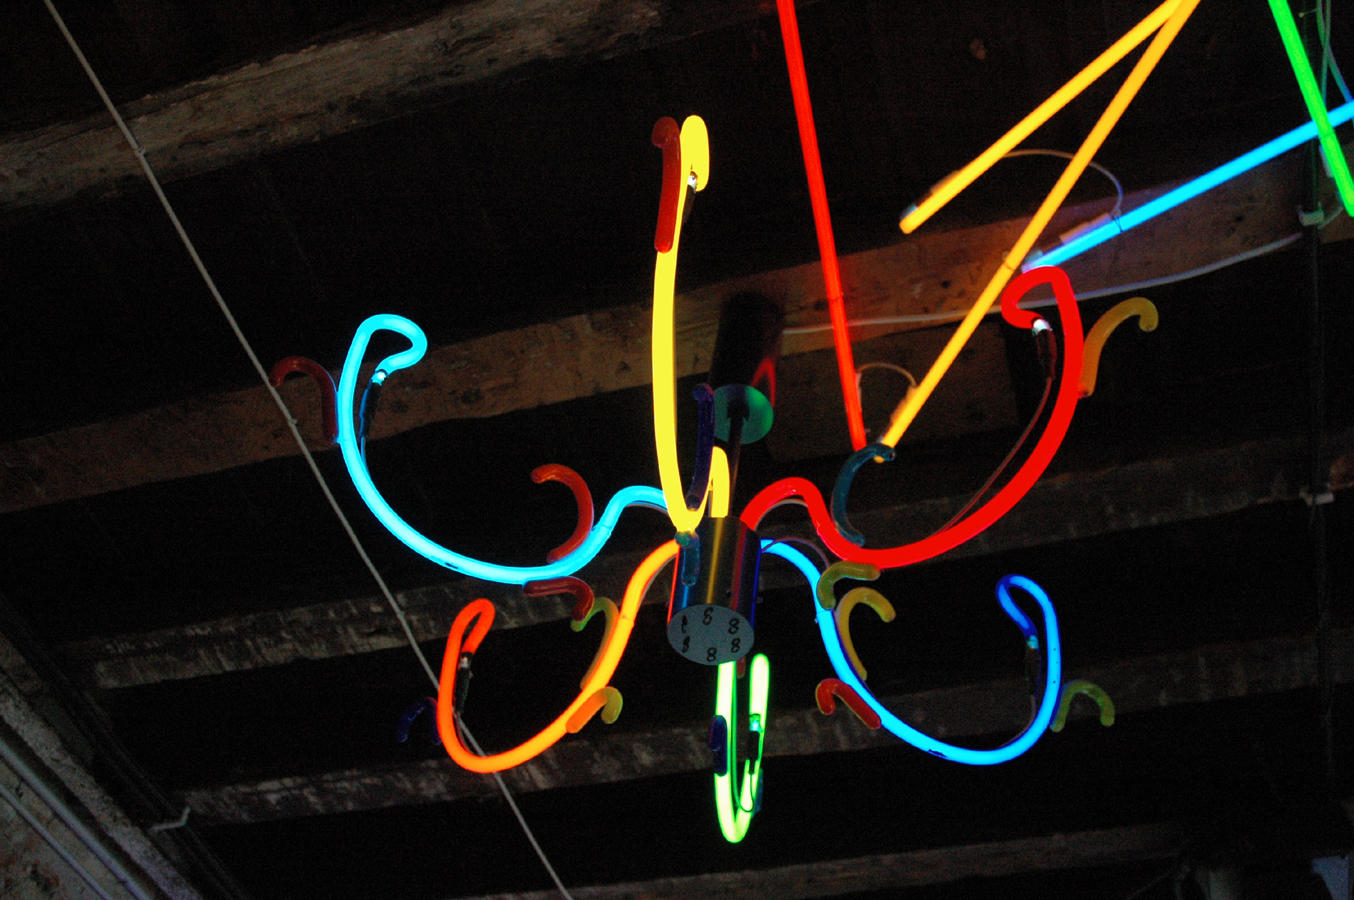 Neon Chandelier by Tricky Guy21 on DeviantArt